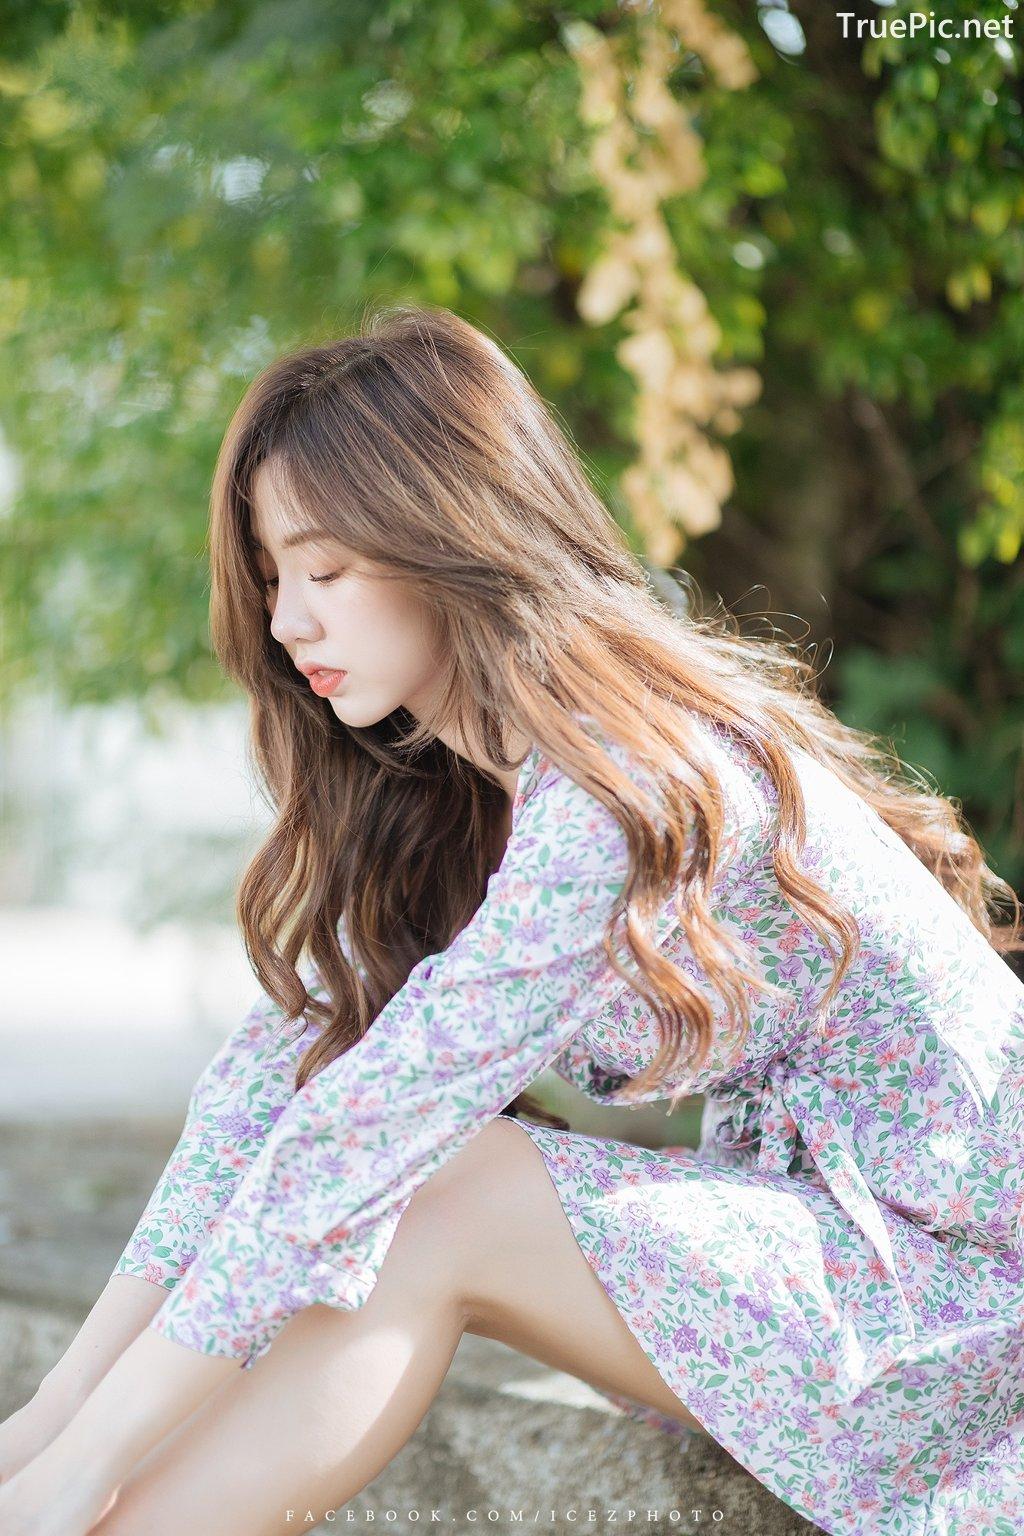 Image-Thailand-Hot-Girl-Nilawan-Iamchuasawad-Pure-Beauty-Early-Morning-TruePic.net- Picture-7